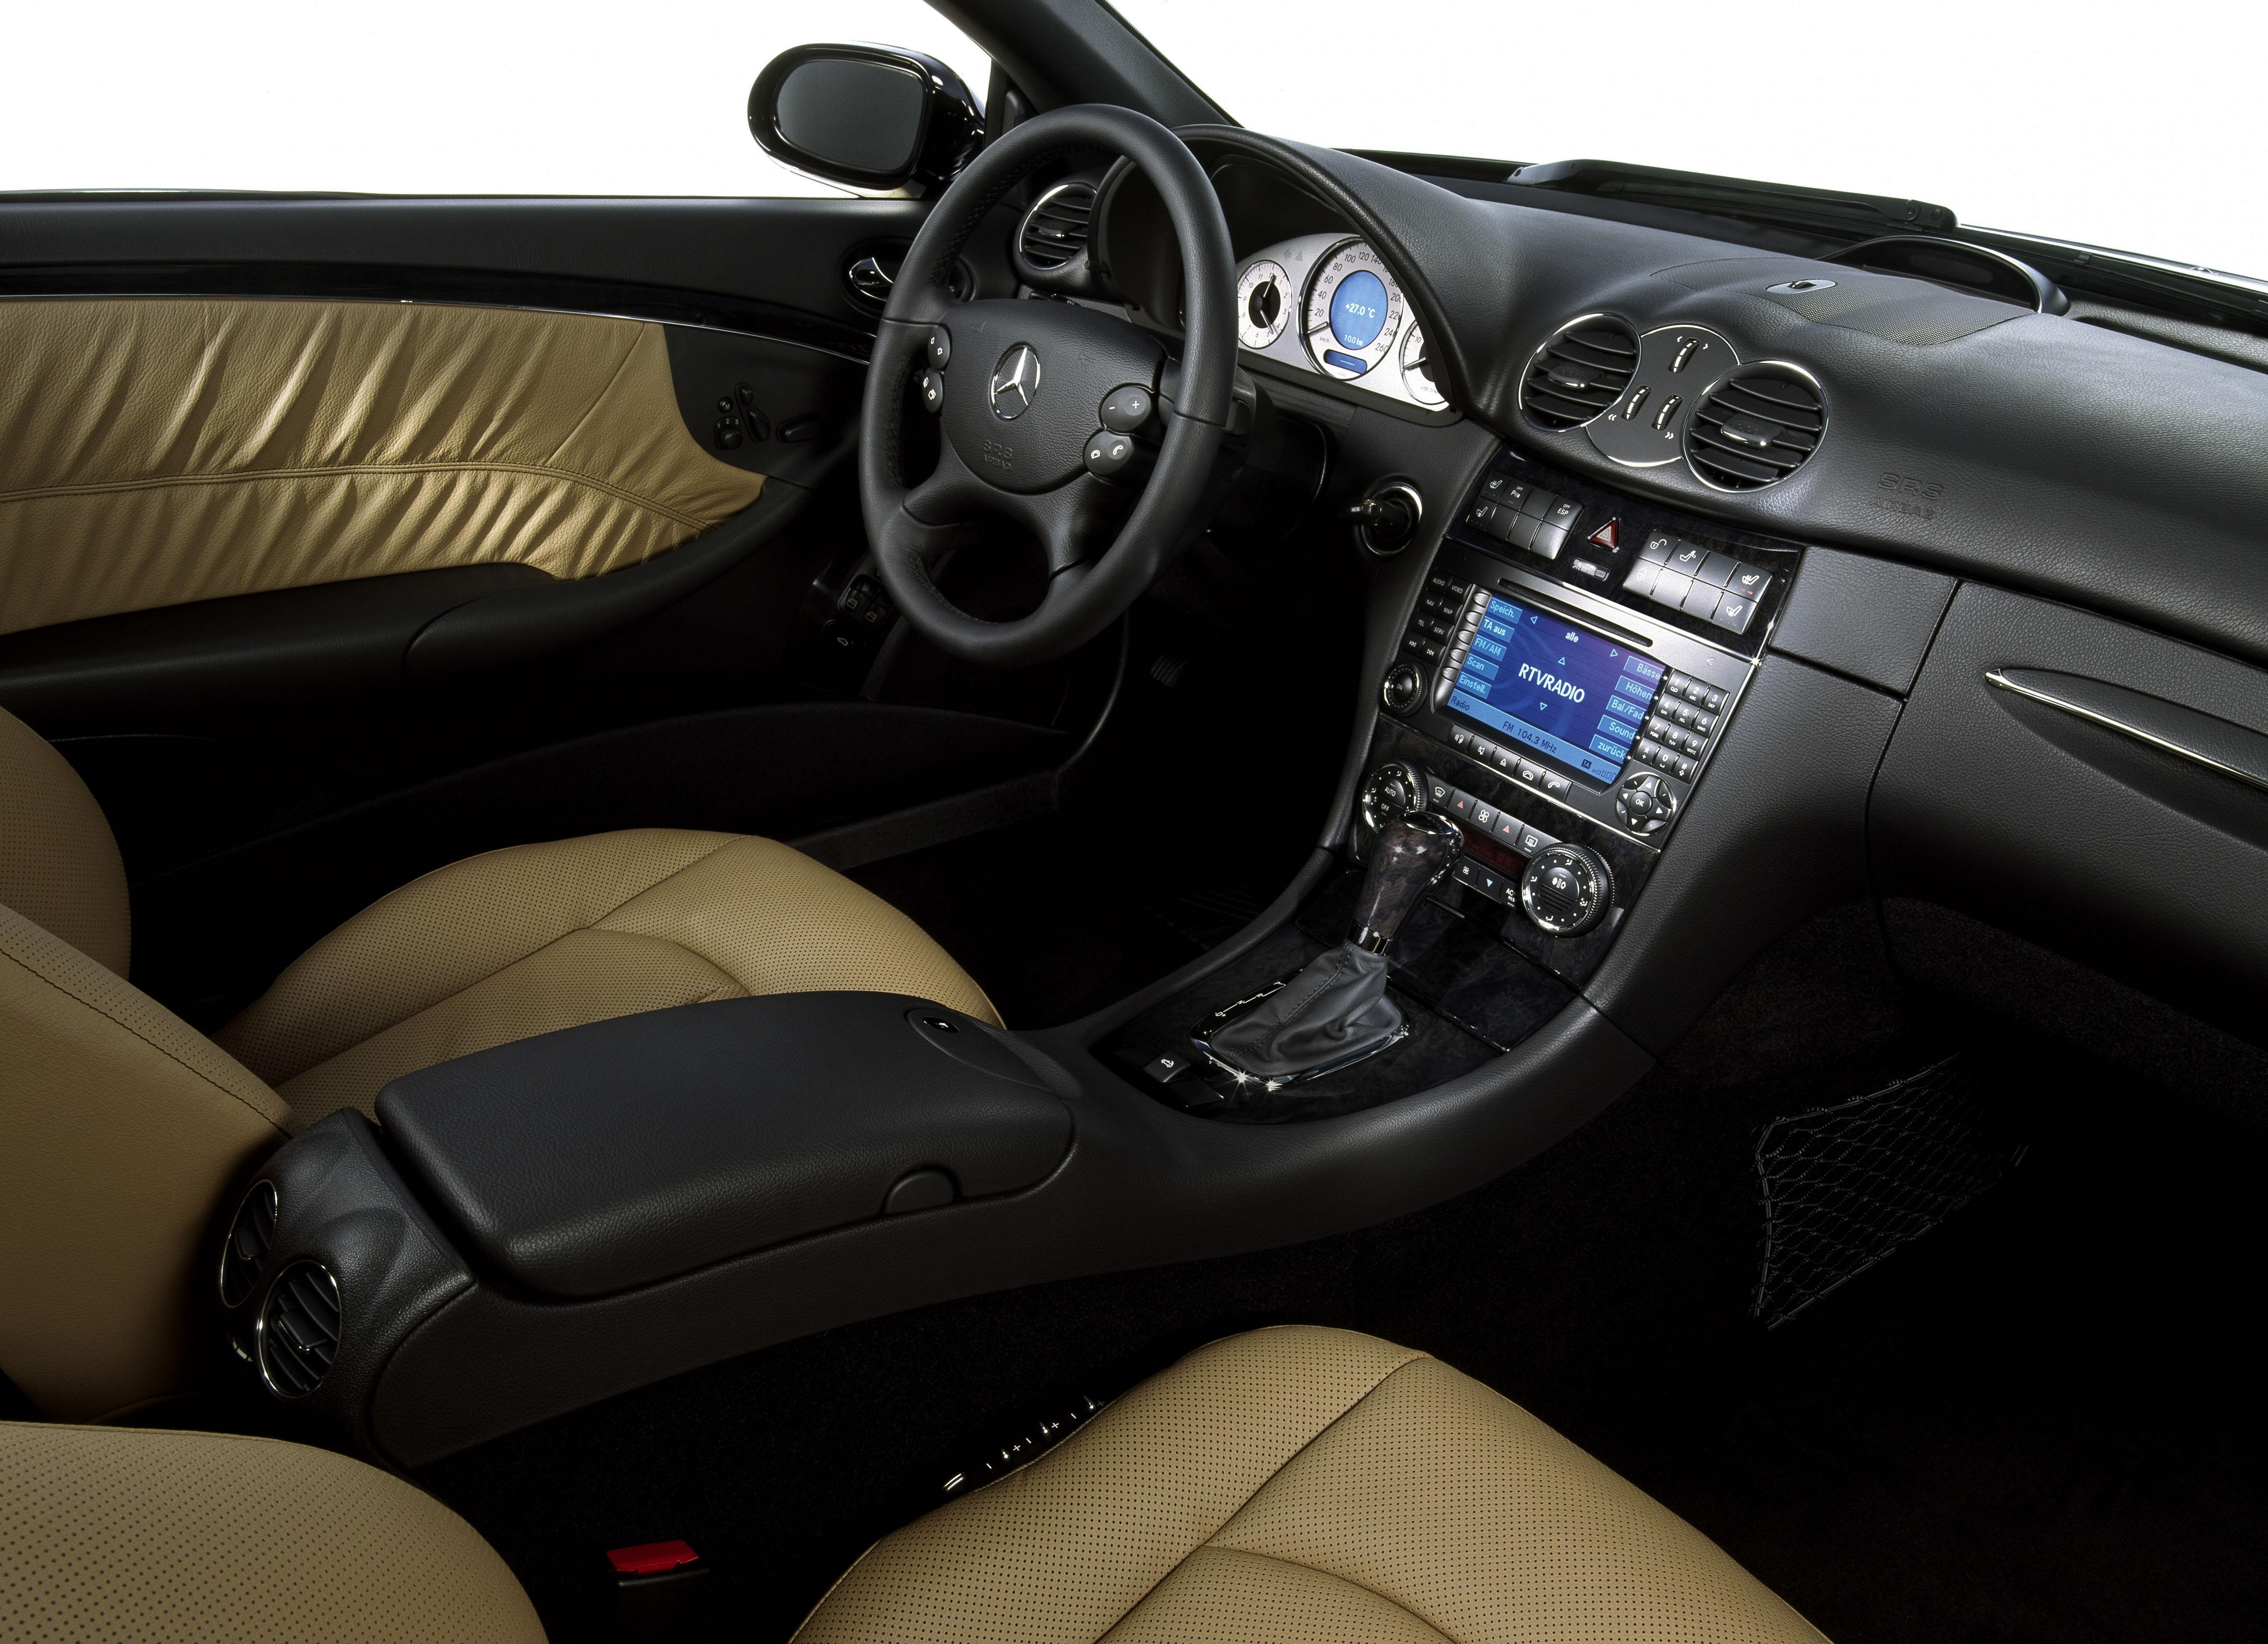 Mini de Fiat Photo Fiat 500X Interieur Tabelau de bord Interior